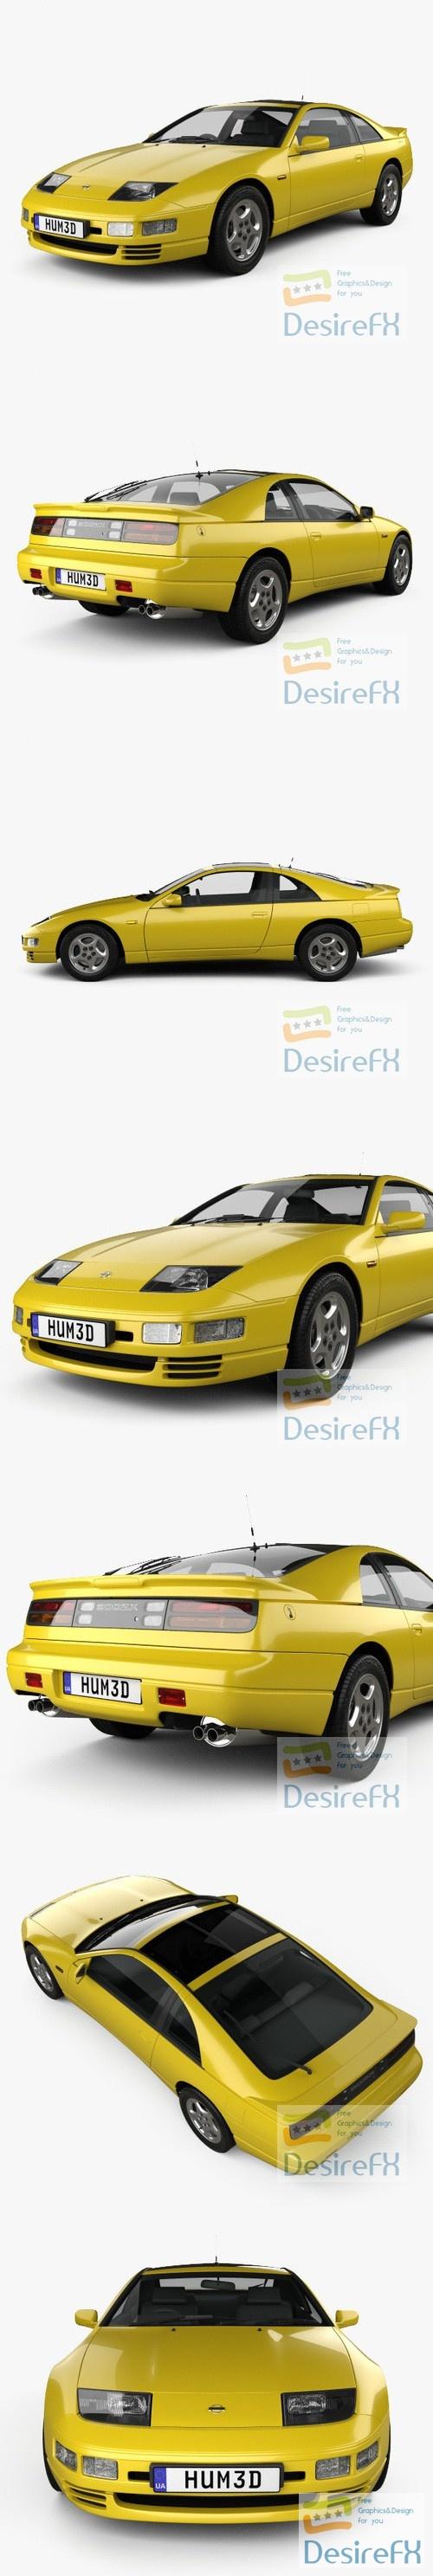 Nissan 300ZX 1989 3D Model